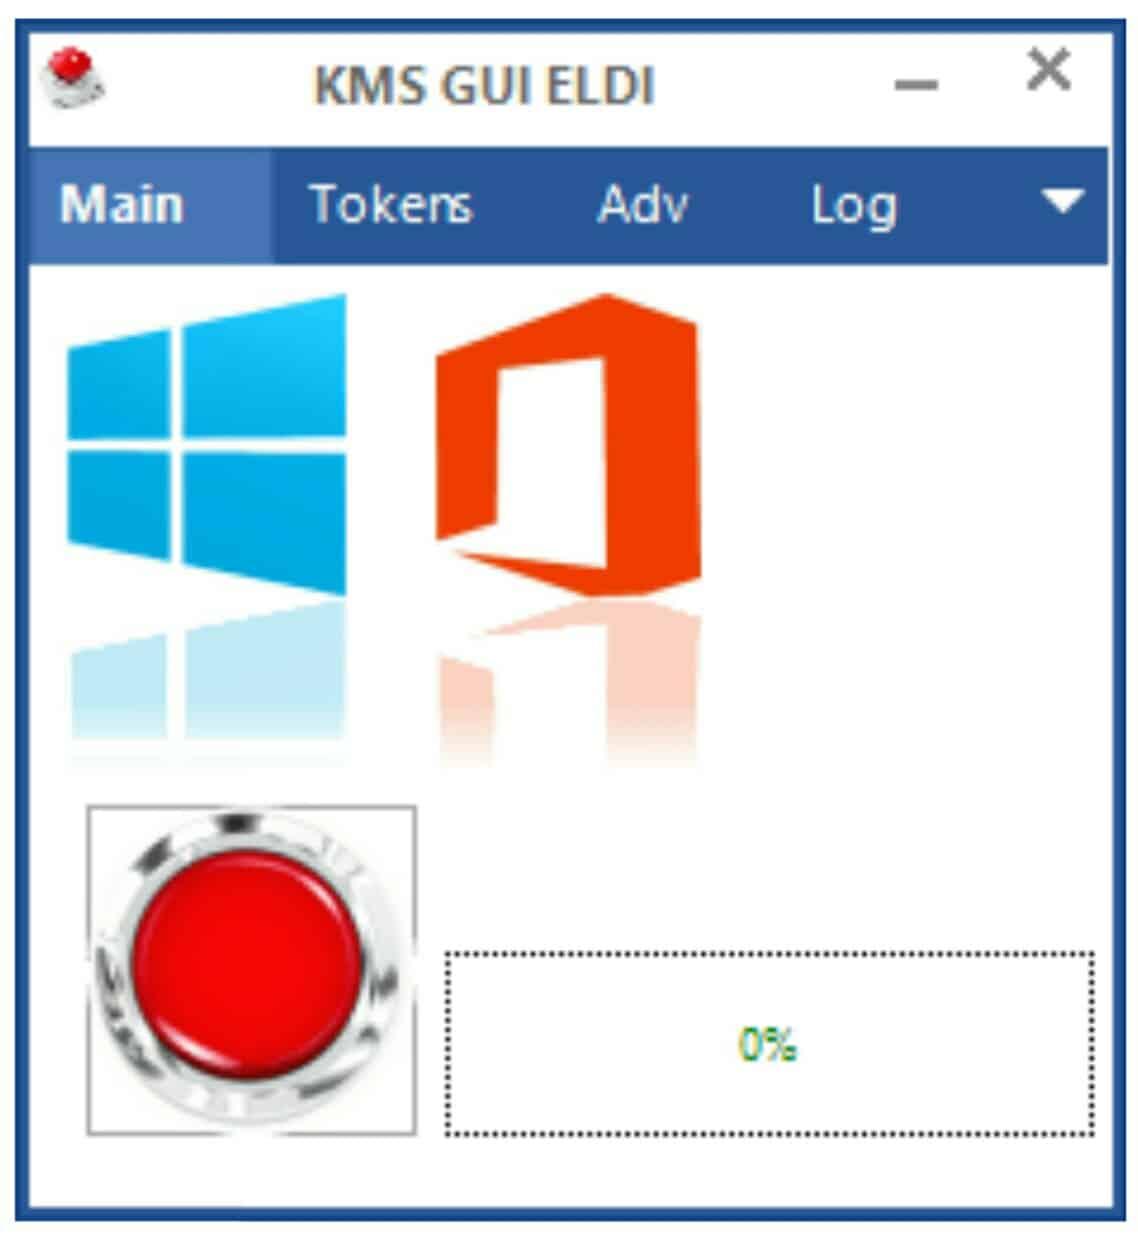 Setelah-aplikasi-terbuka-proses-aktivasi-Windows-10-akan-berjalan-secara-otomatis